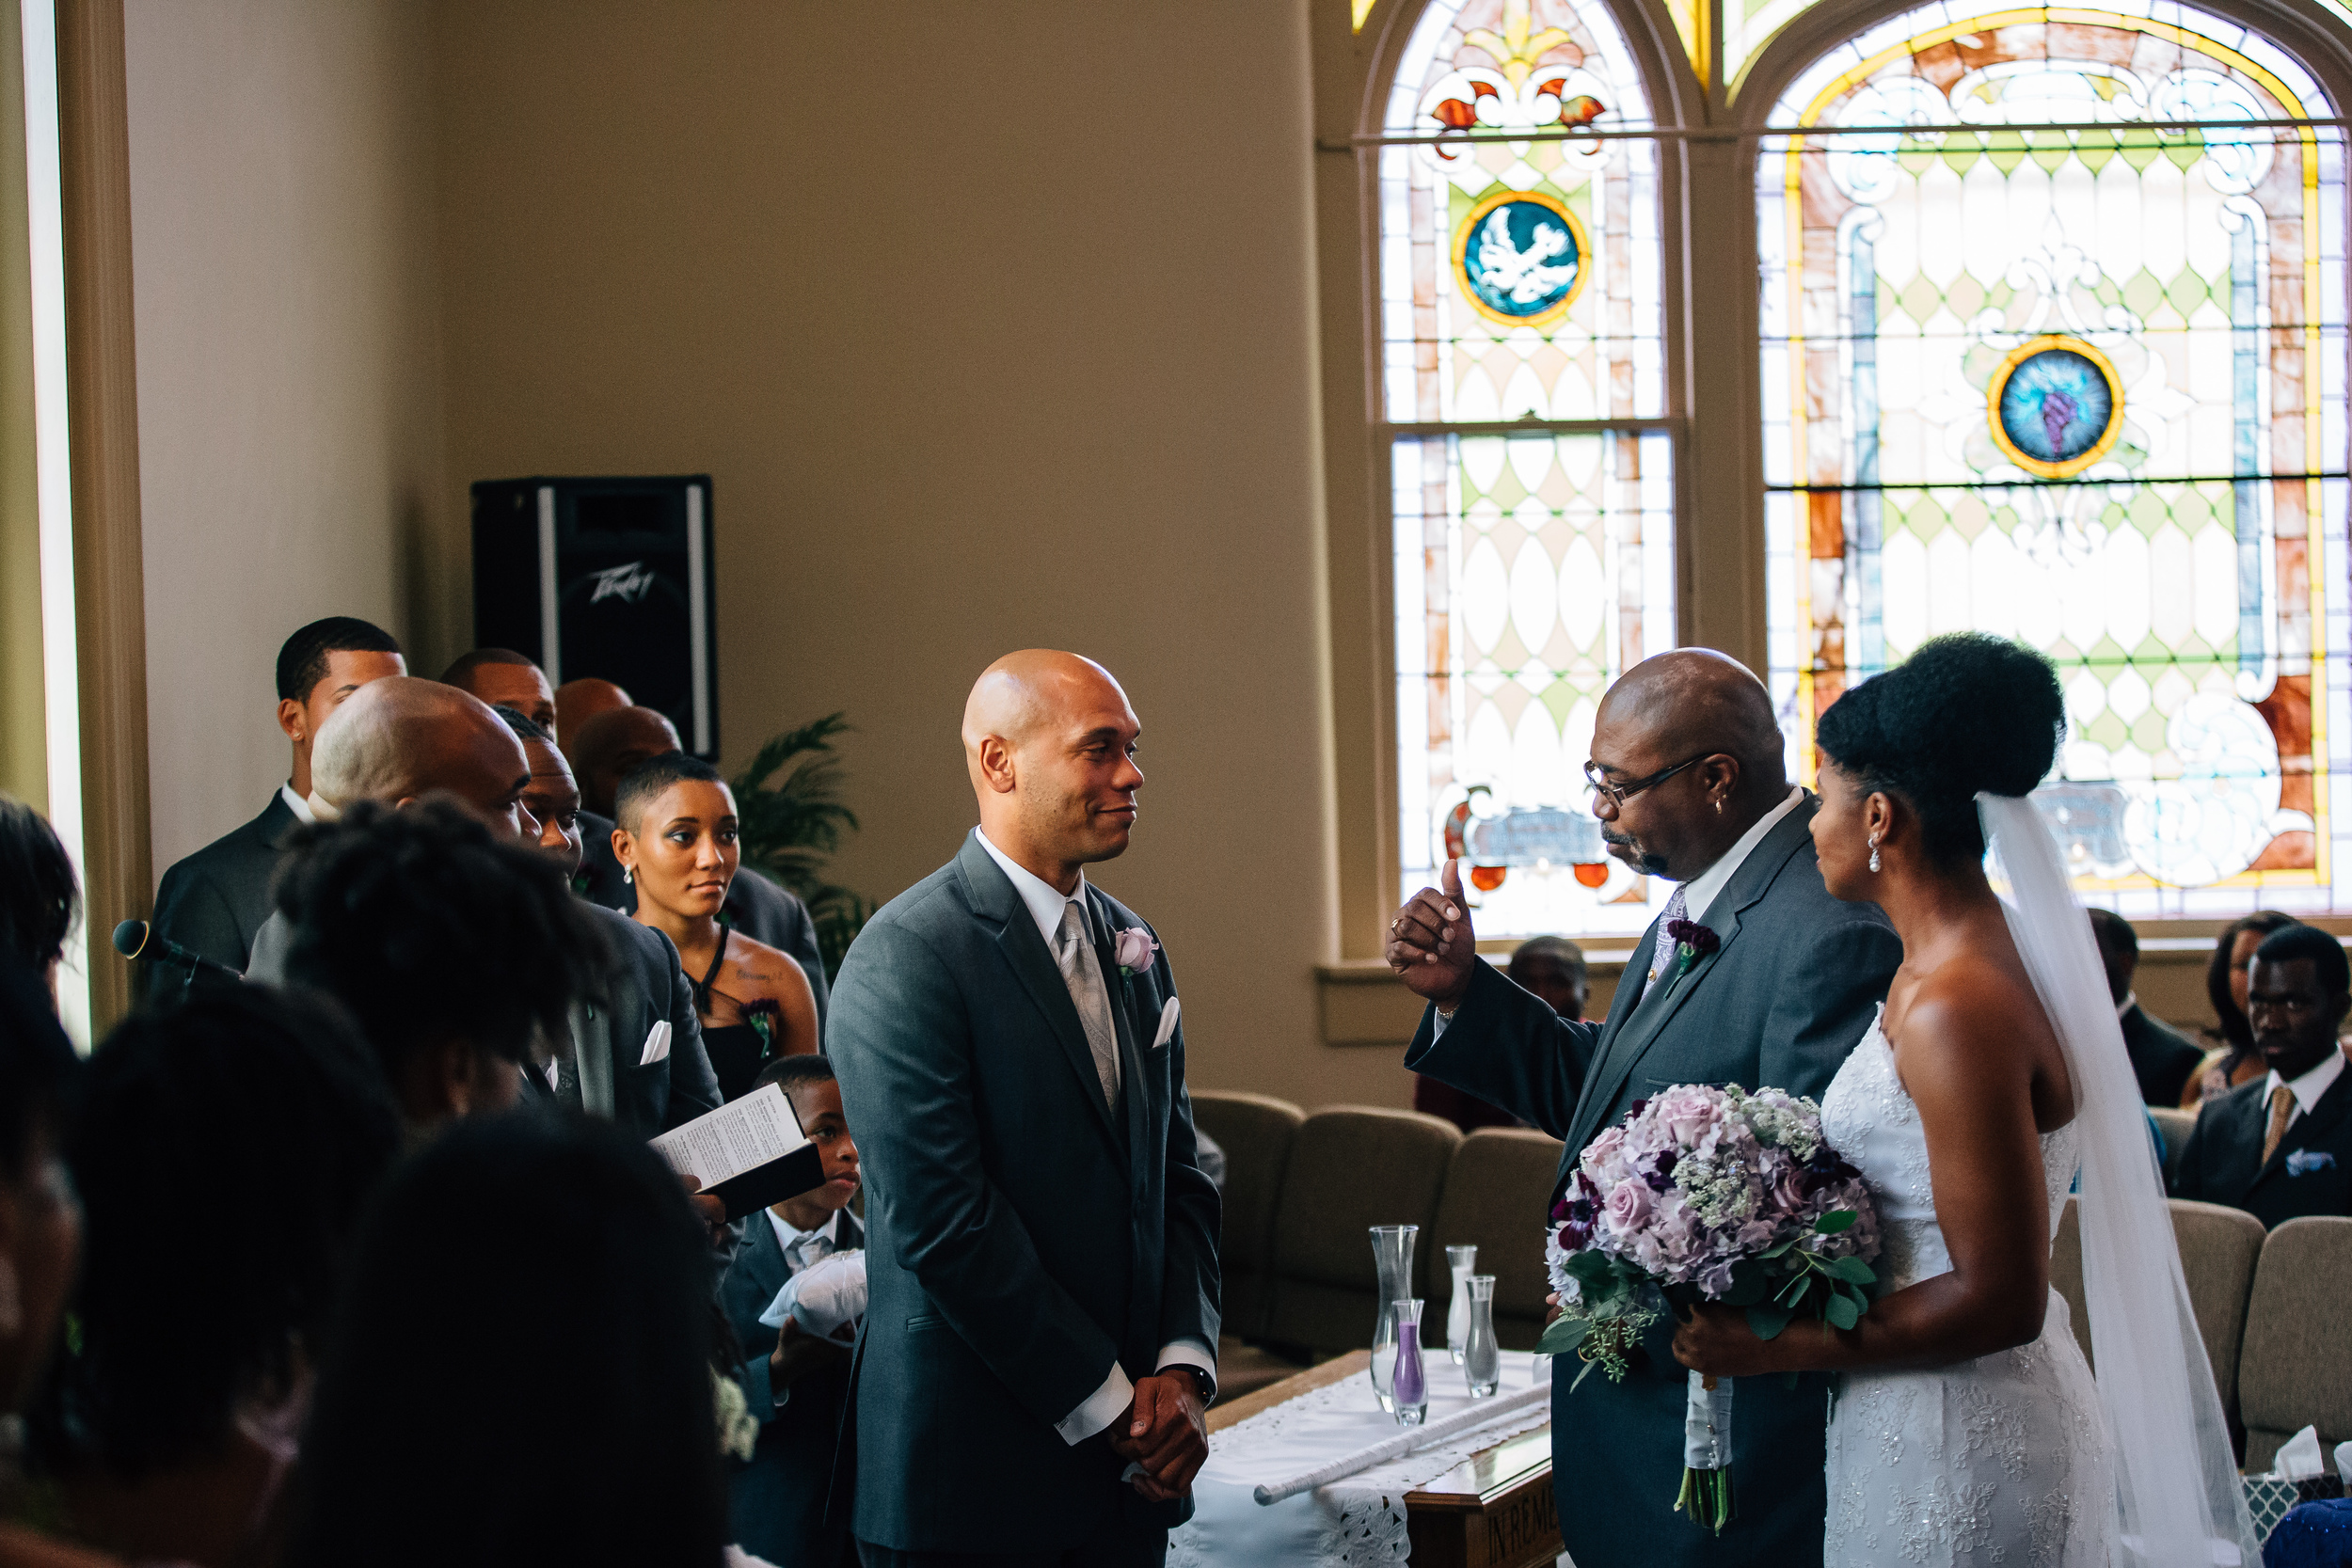 Chuck & Alicia's Wedding - Corrie Mick Photography-241.jpg